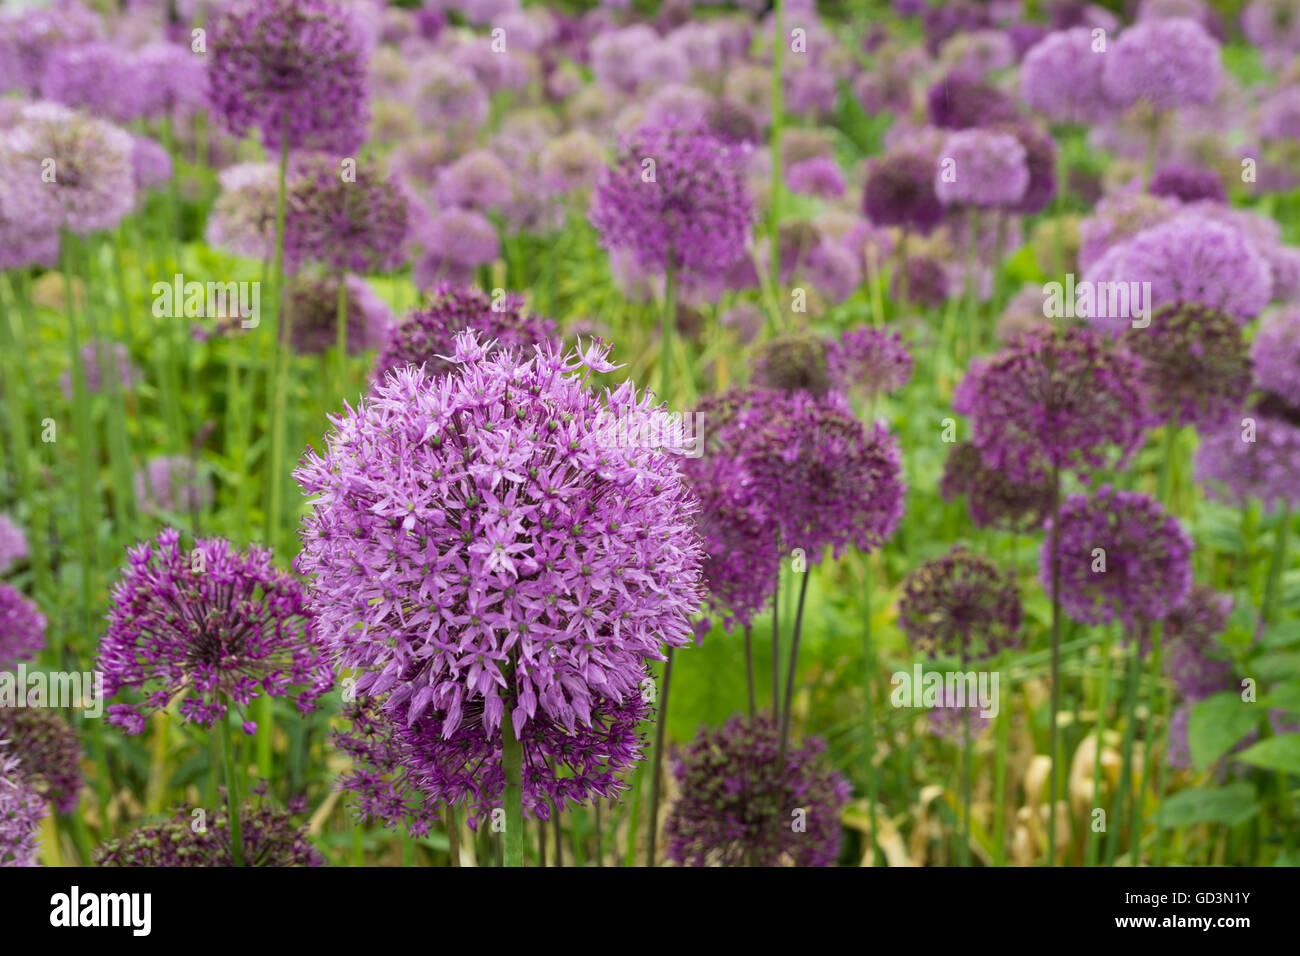 Purple Allium flowers - Stock Image